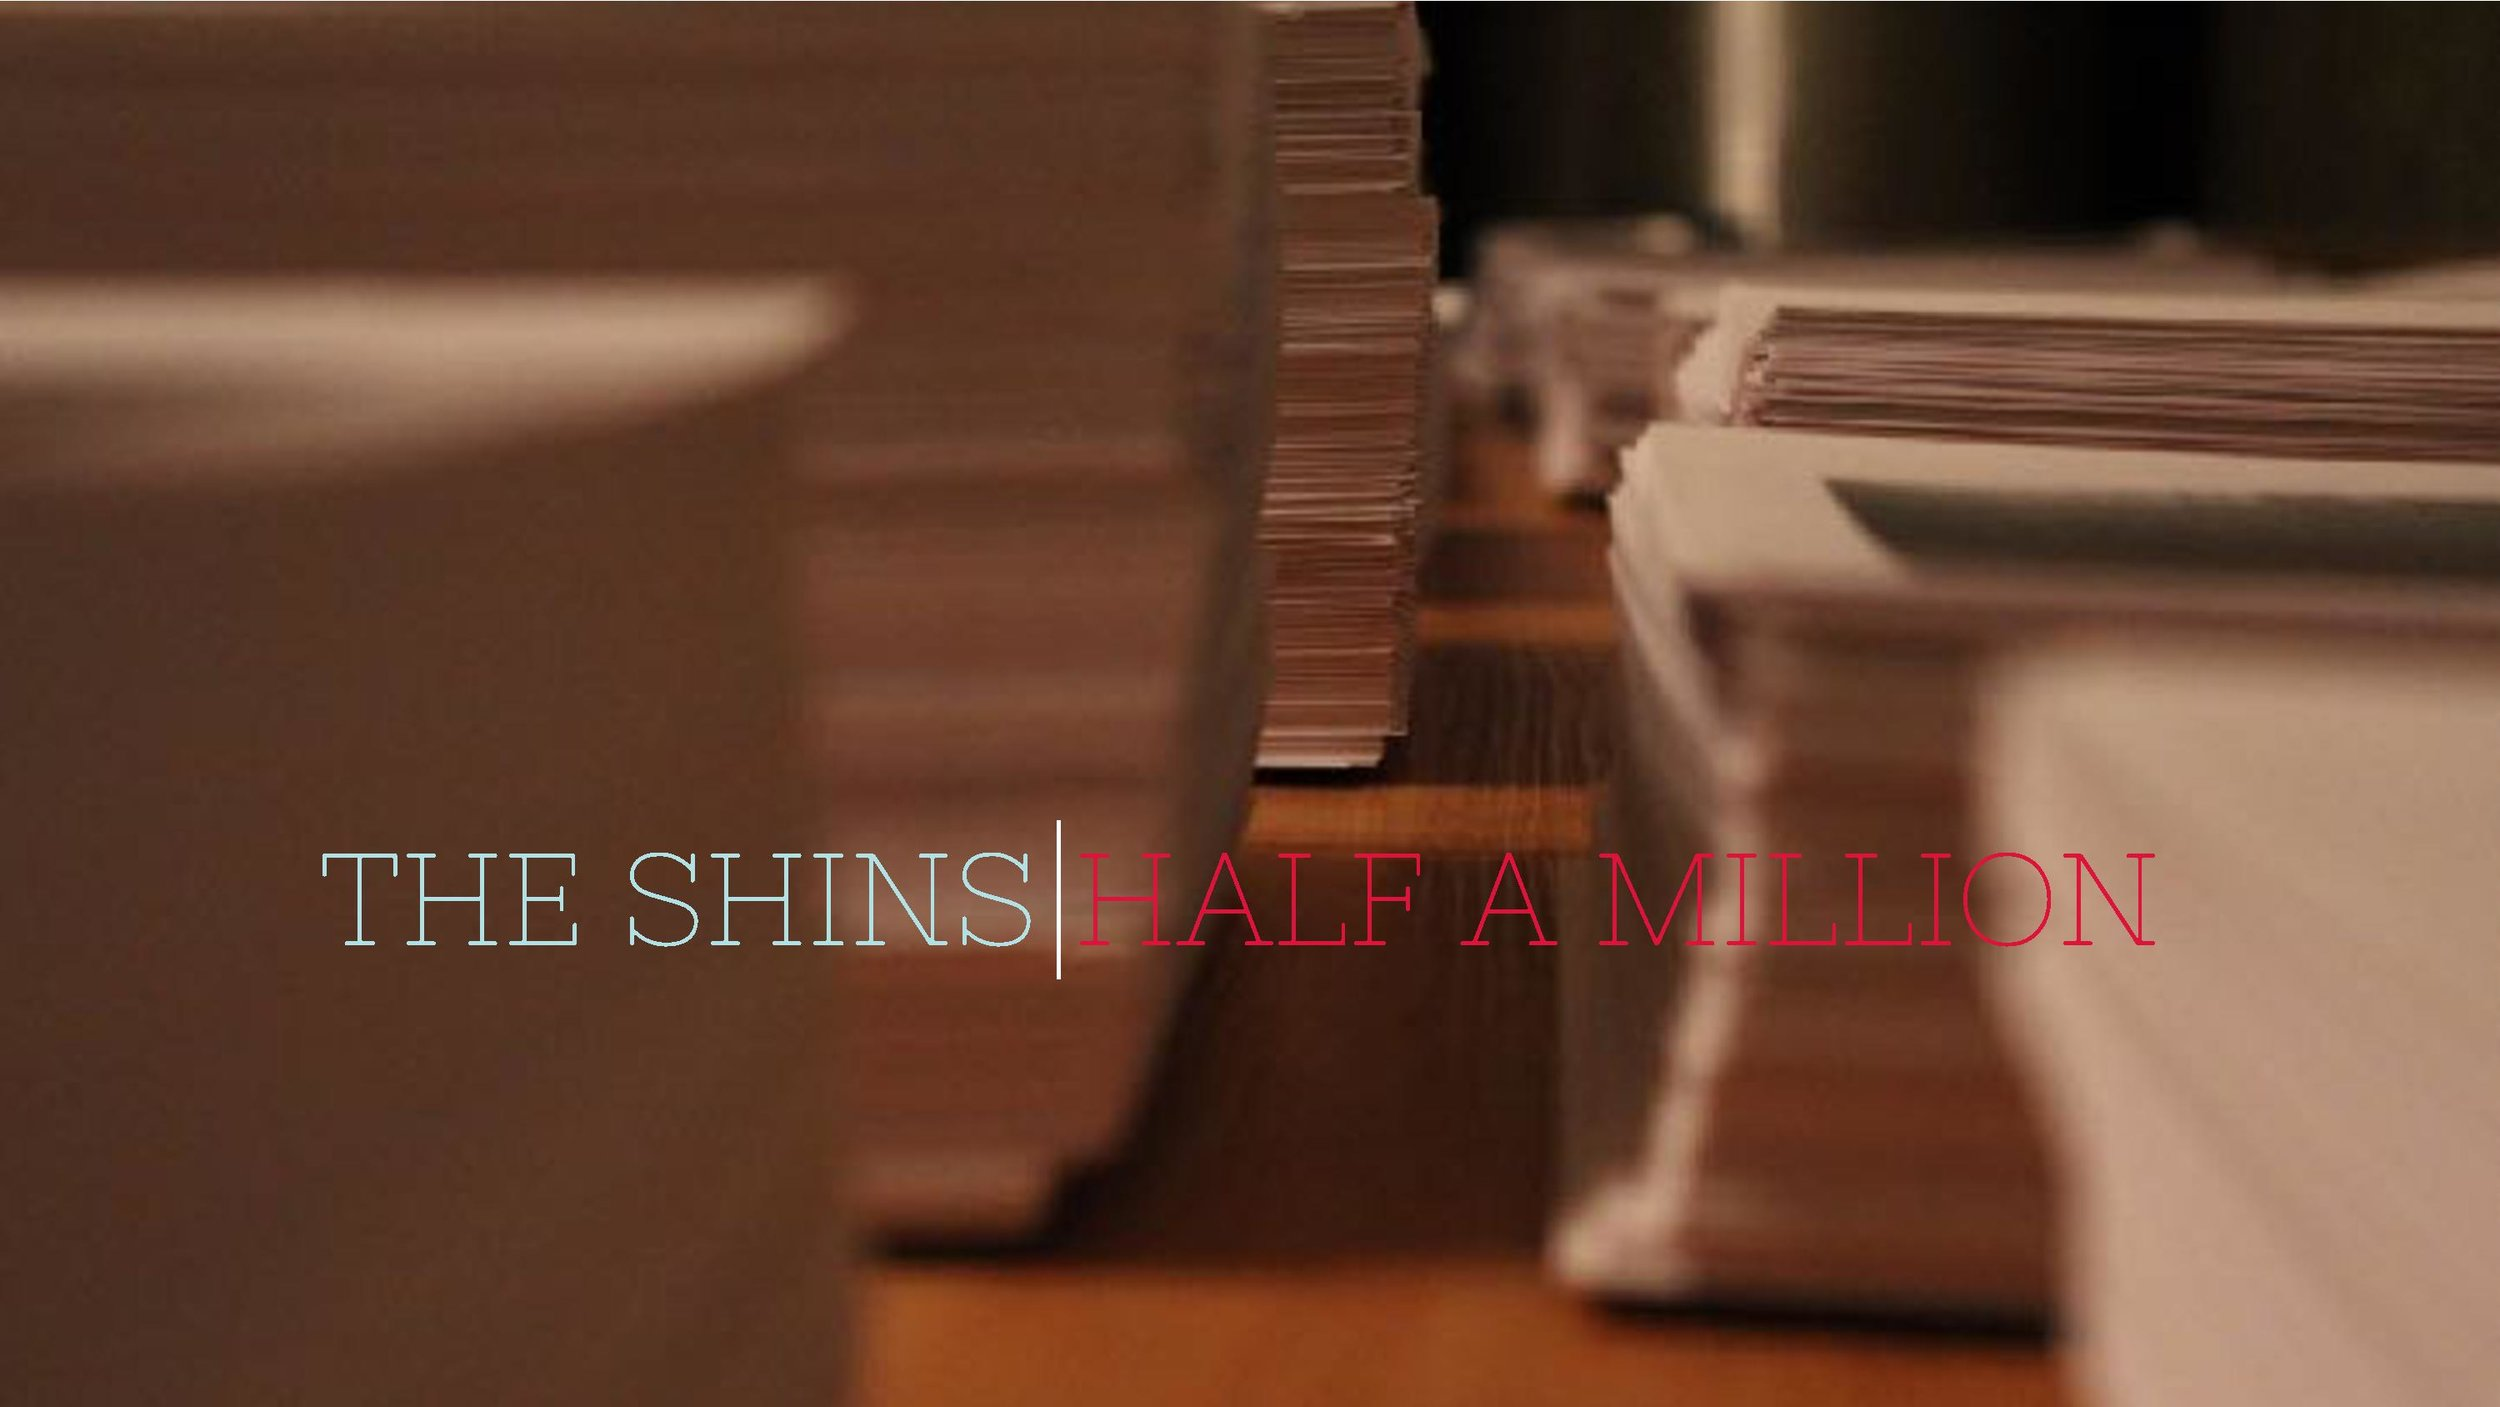 SHINS_HALF_A_Million_L+N.jpg